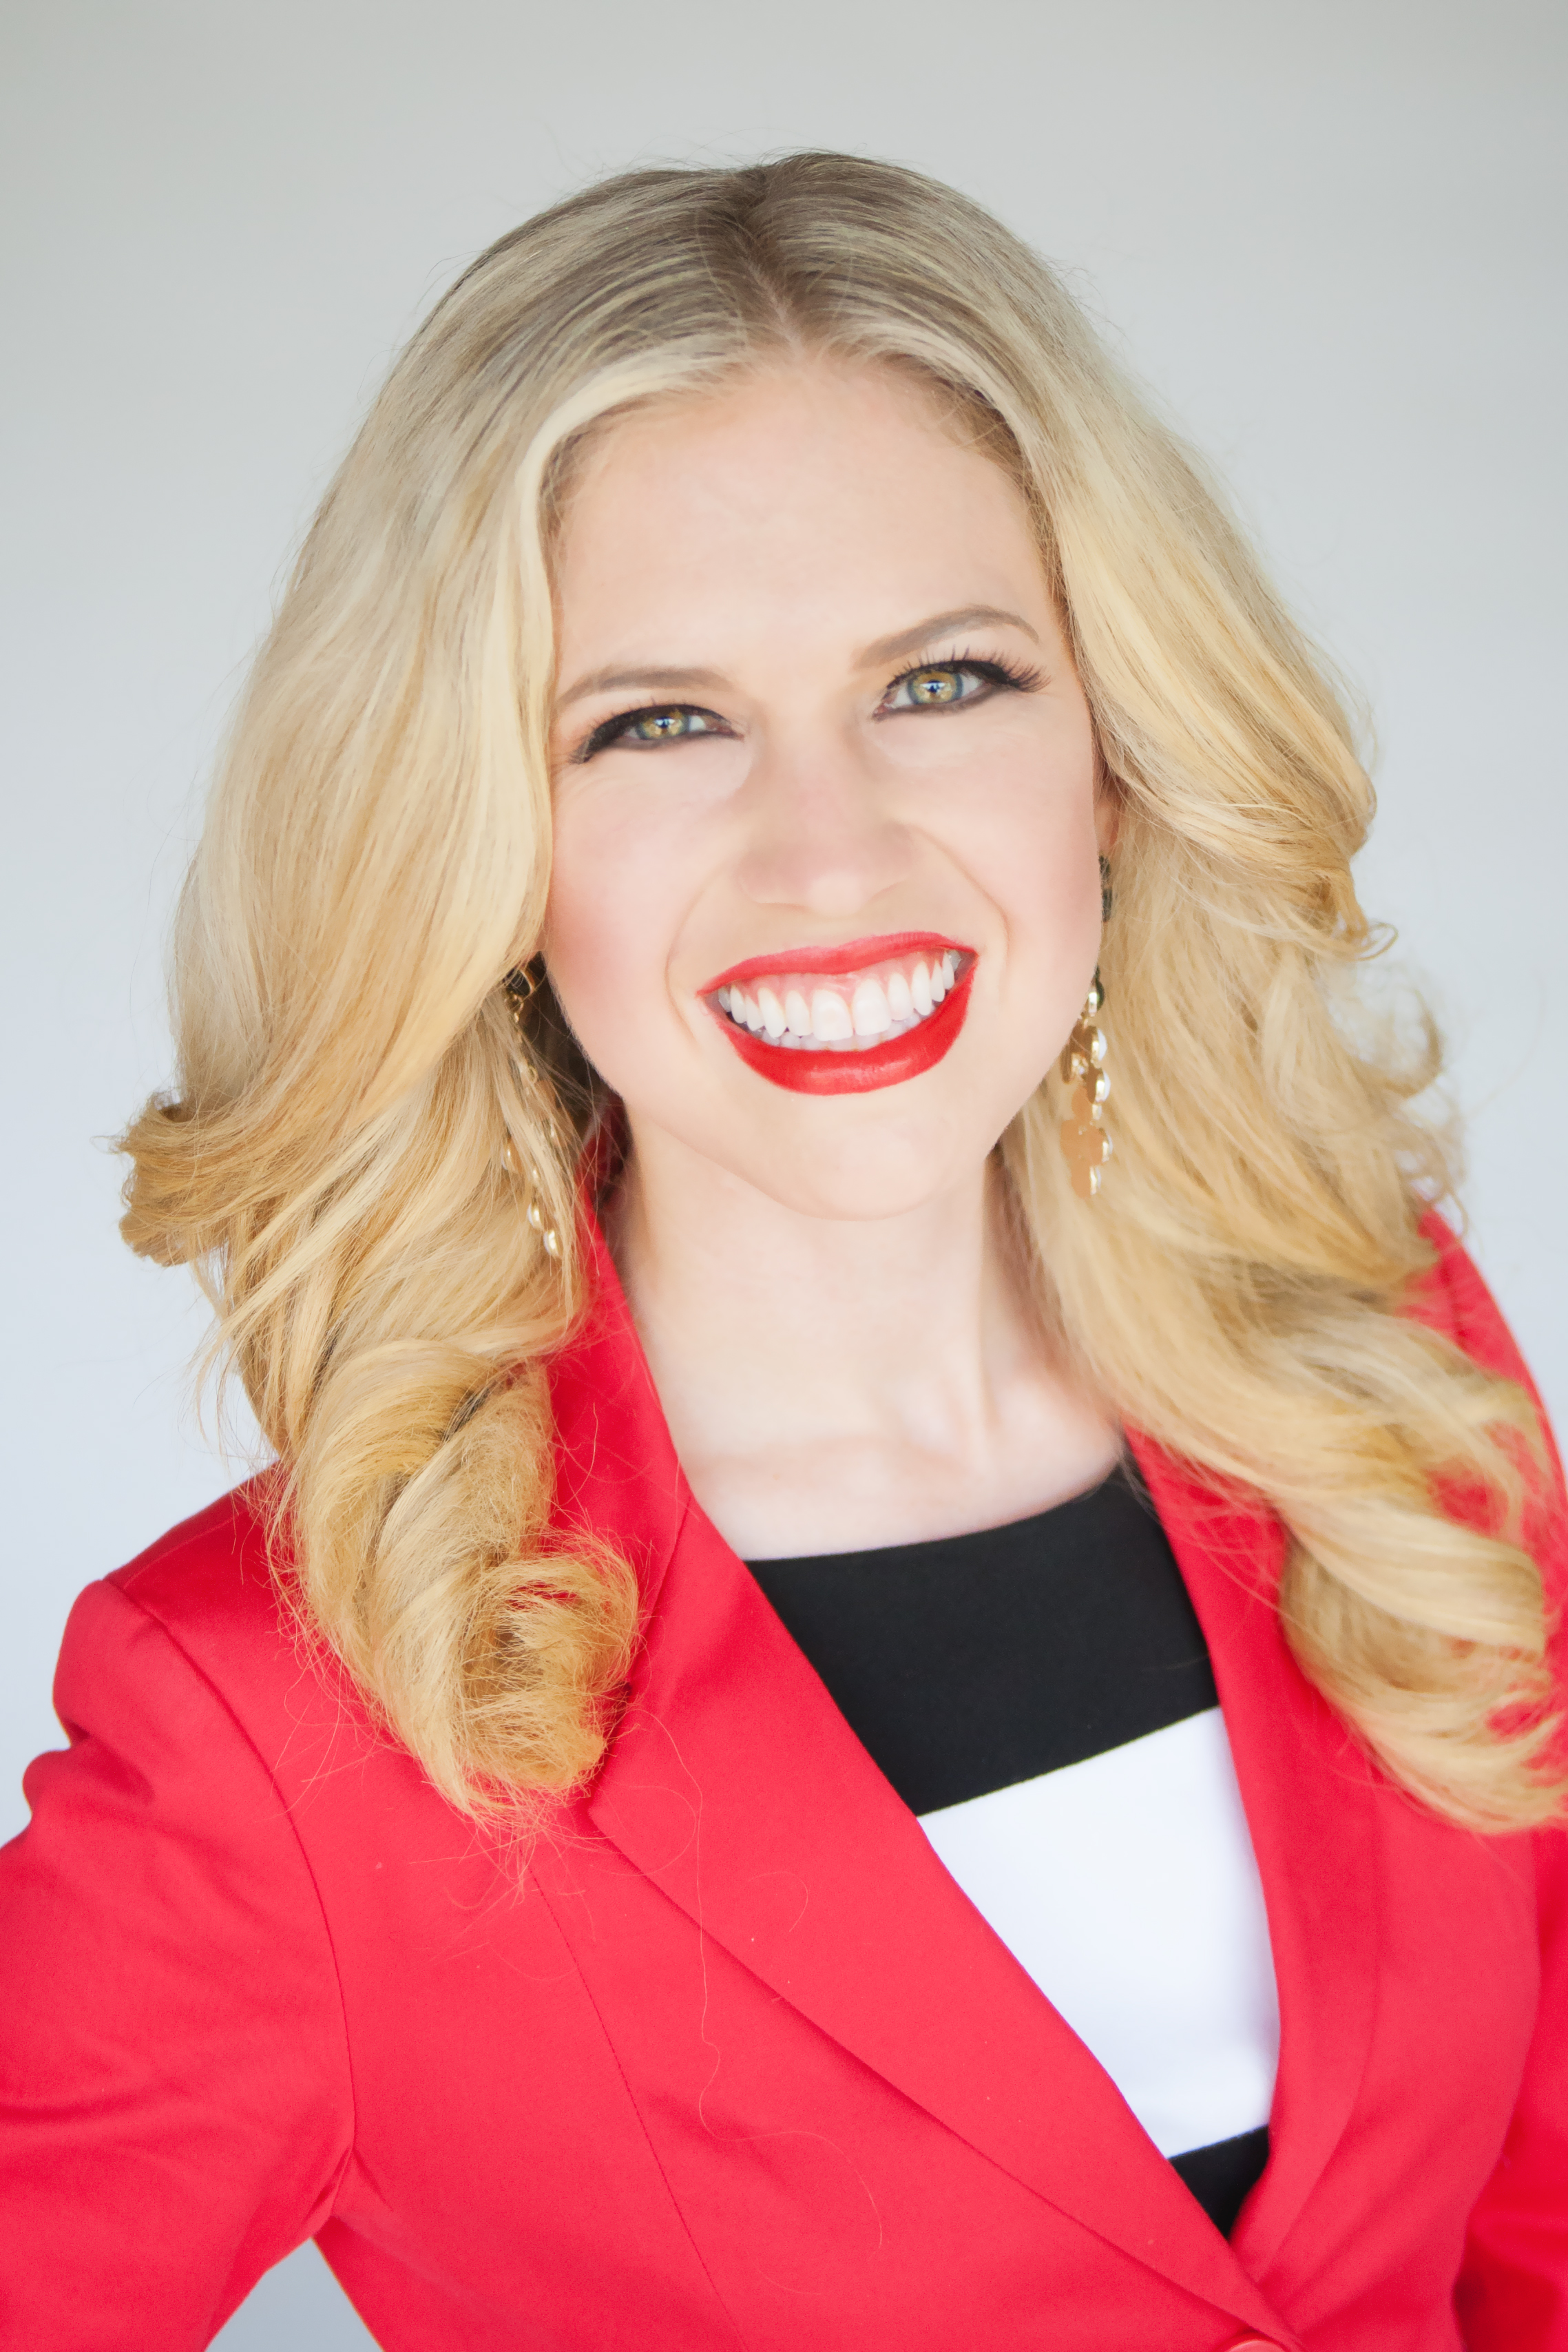 Meet Koach Katlyn CEO of the Koach Katlyn Company! -